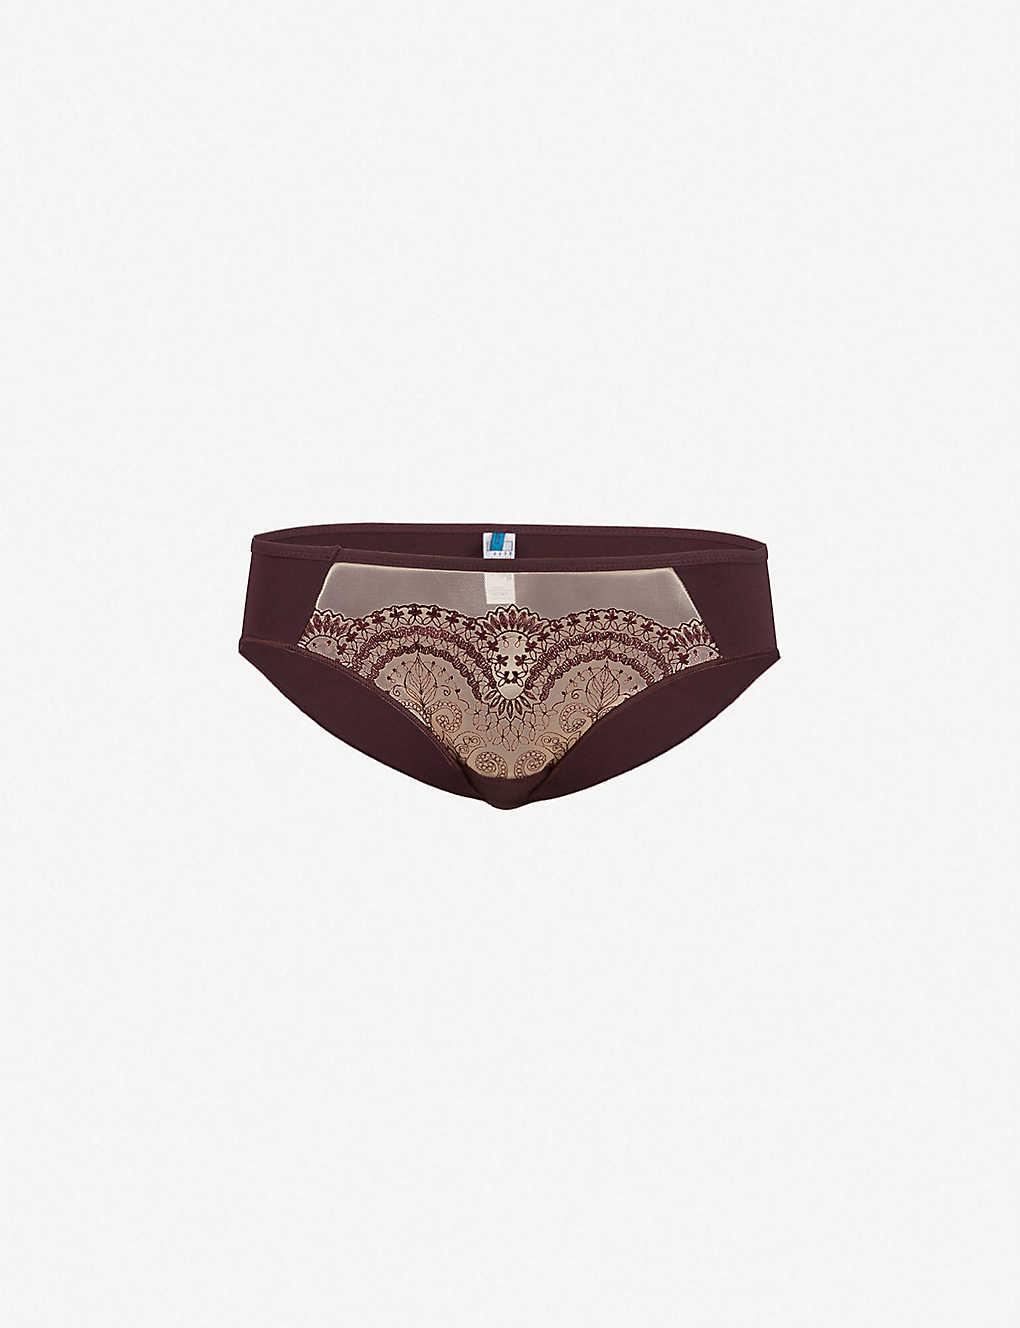 c5b47b4d3ce4 MAISON LEJABY - Tattoo floral-lace and jersey bikini briefs ...